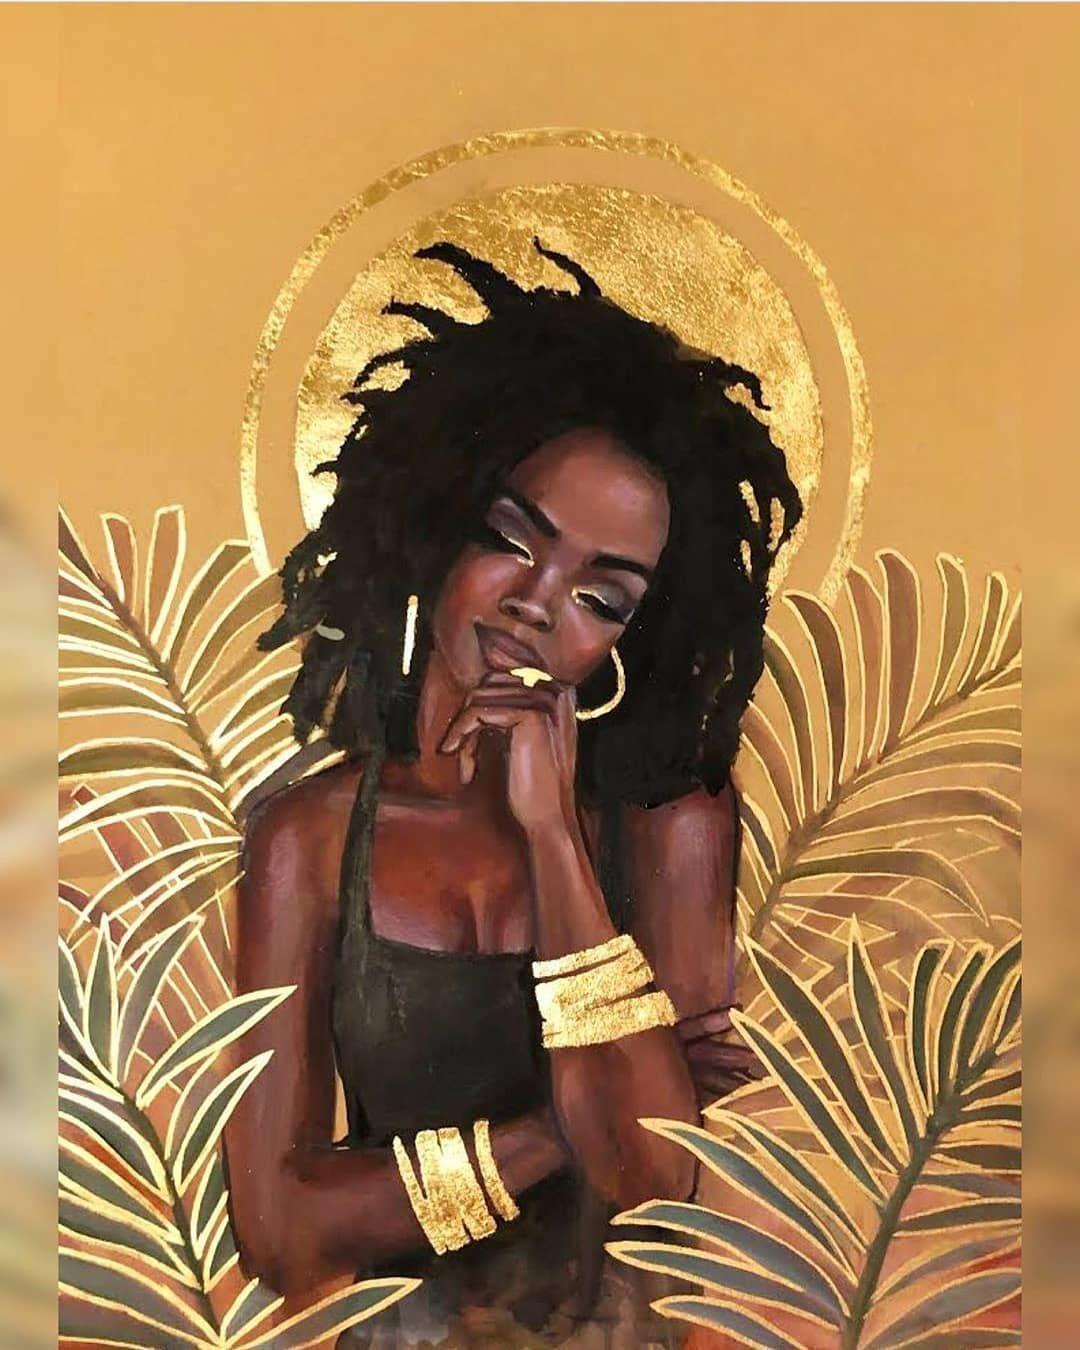 Black Artist Space On Instagram By Tshikamba Repost Queen Lauryn Hill 18 I M Doing Black Art Painting Black Girl Art Black Artists